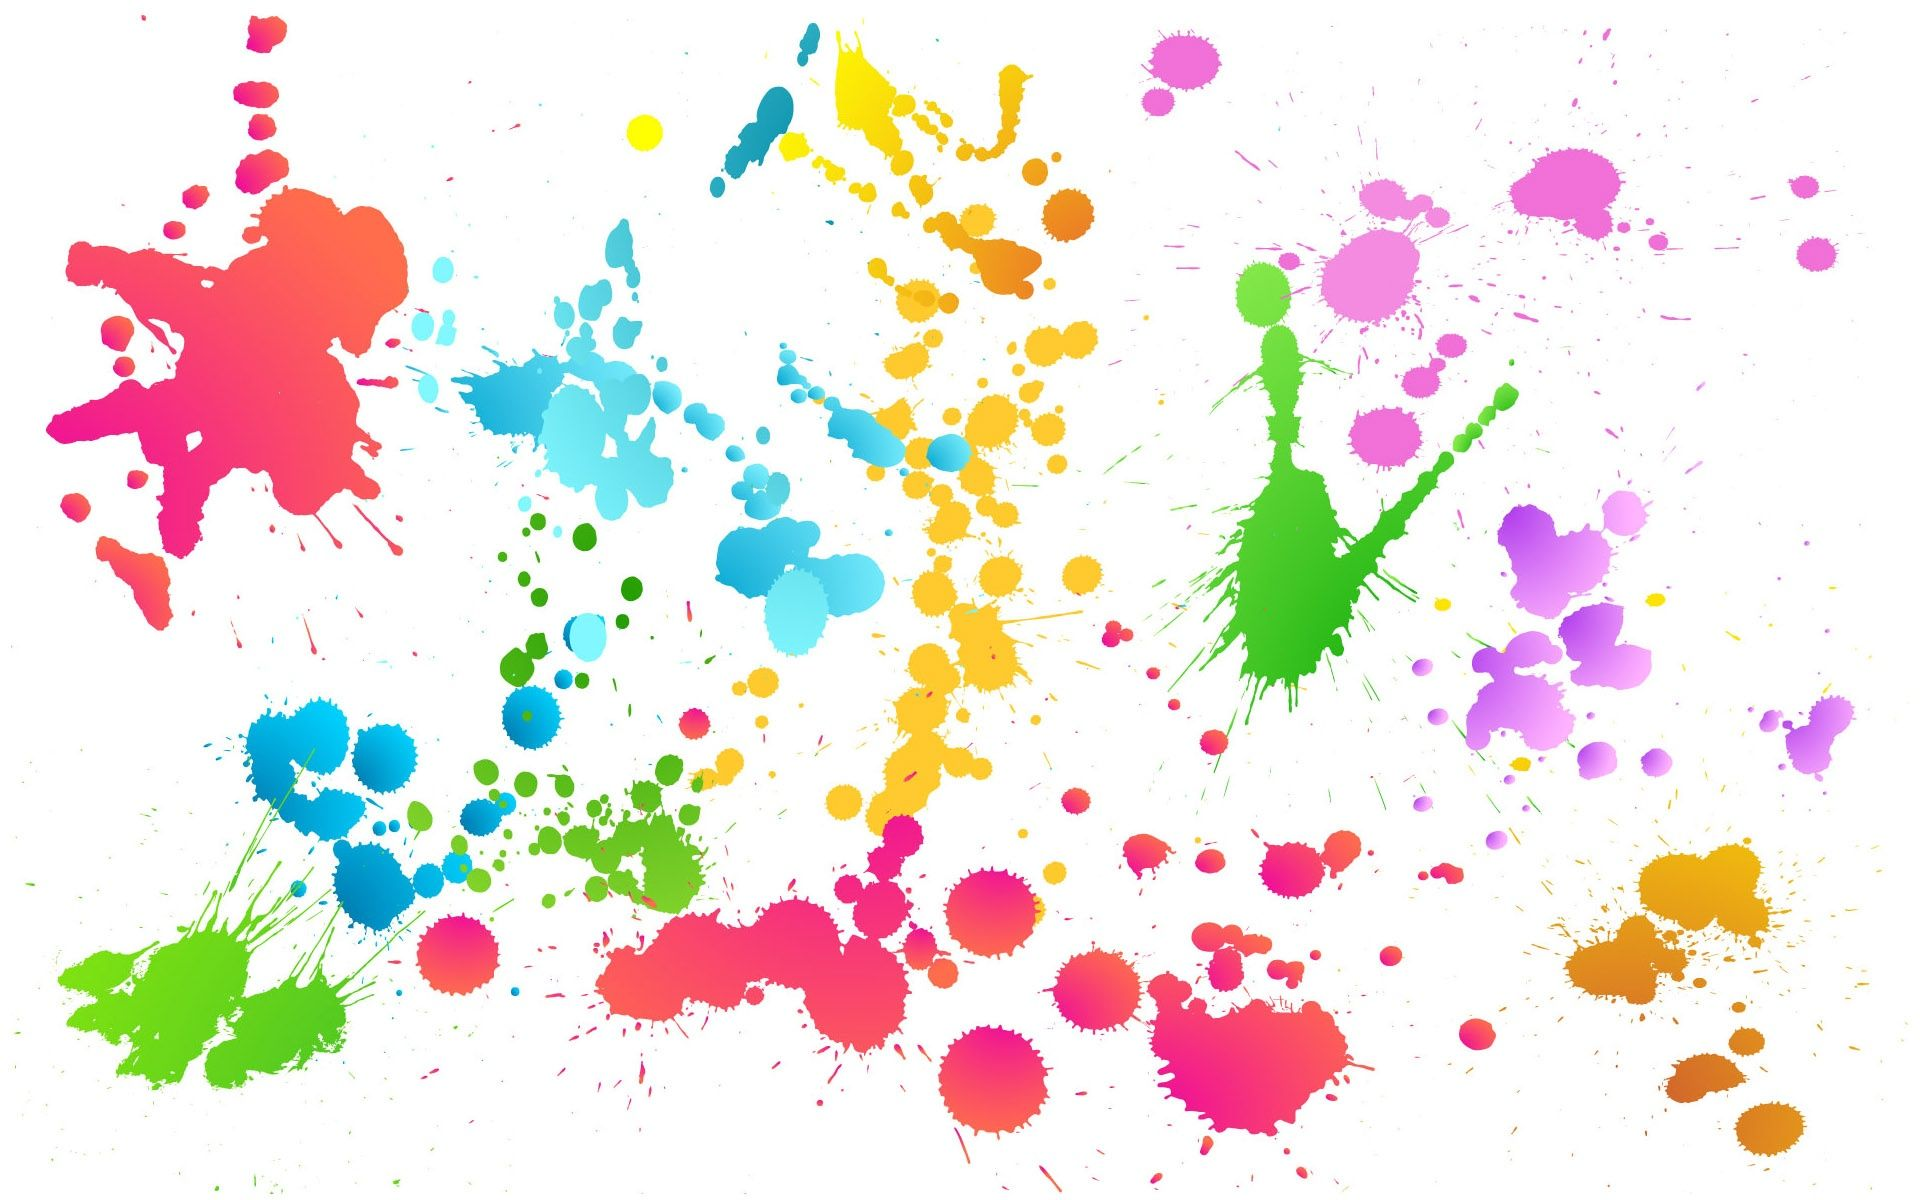 abstract-paint-splash-wallpapers-full-hd-wallpaper-white